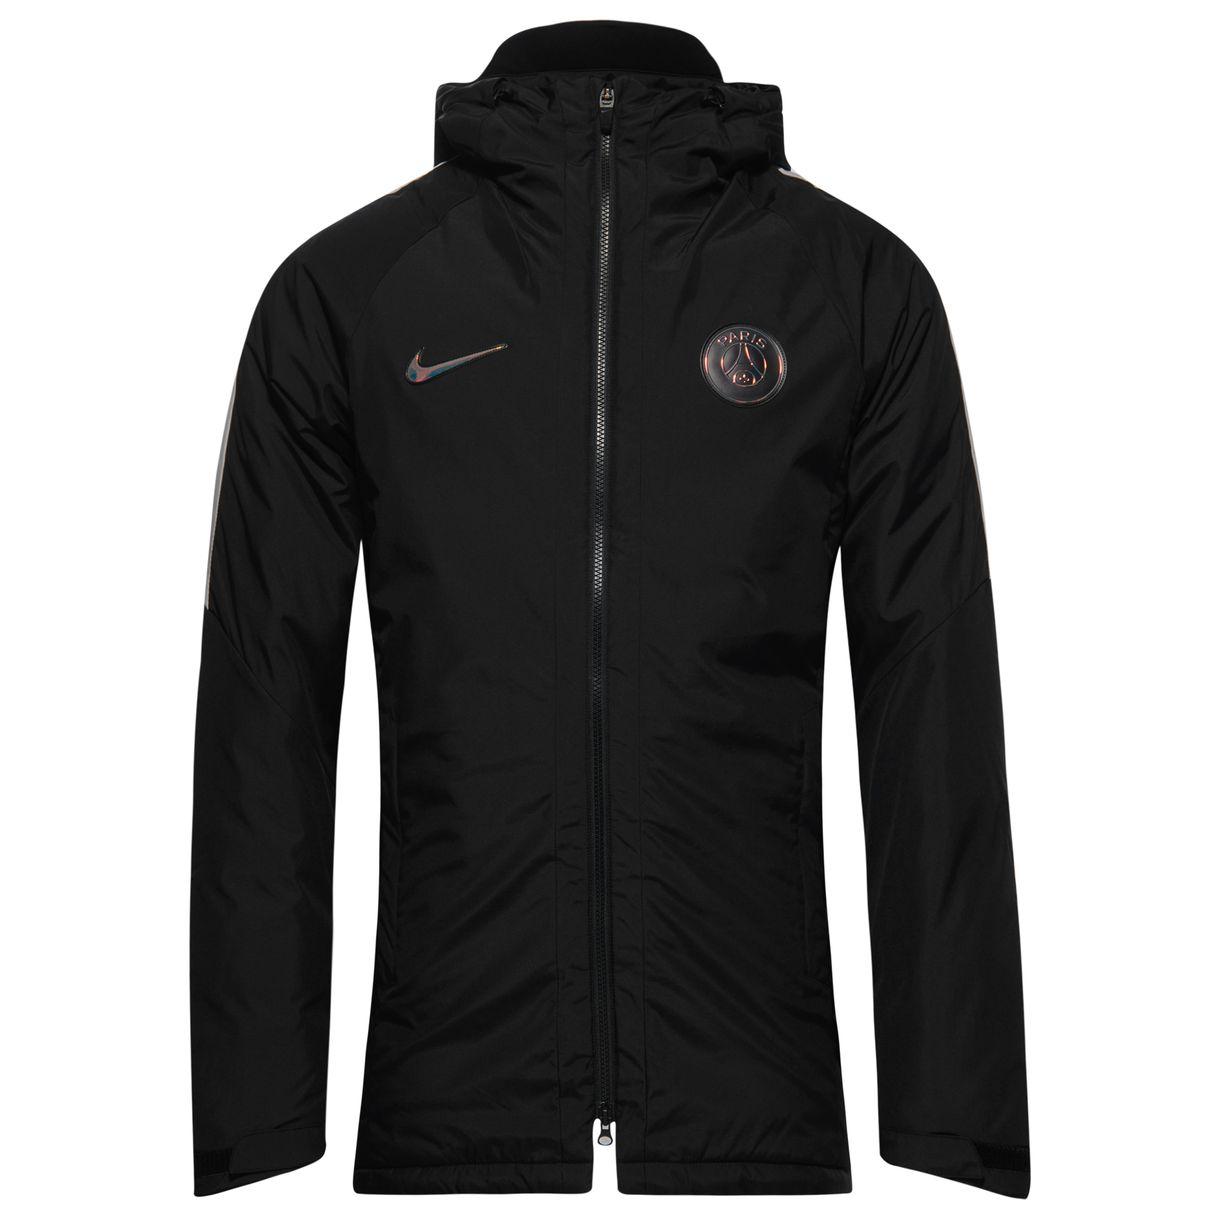 Galatasaray trainer jacke